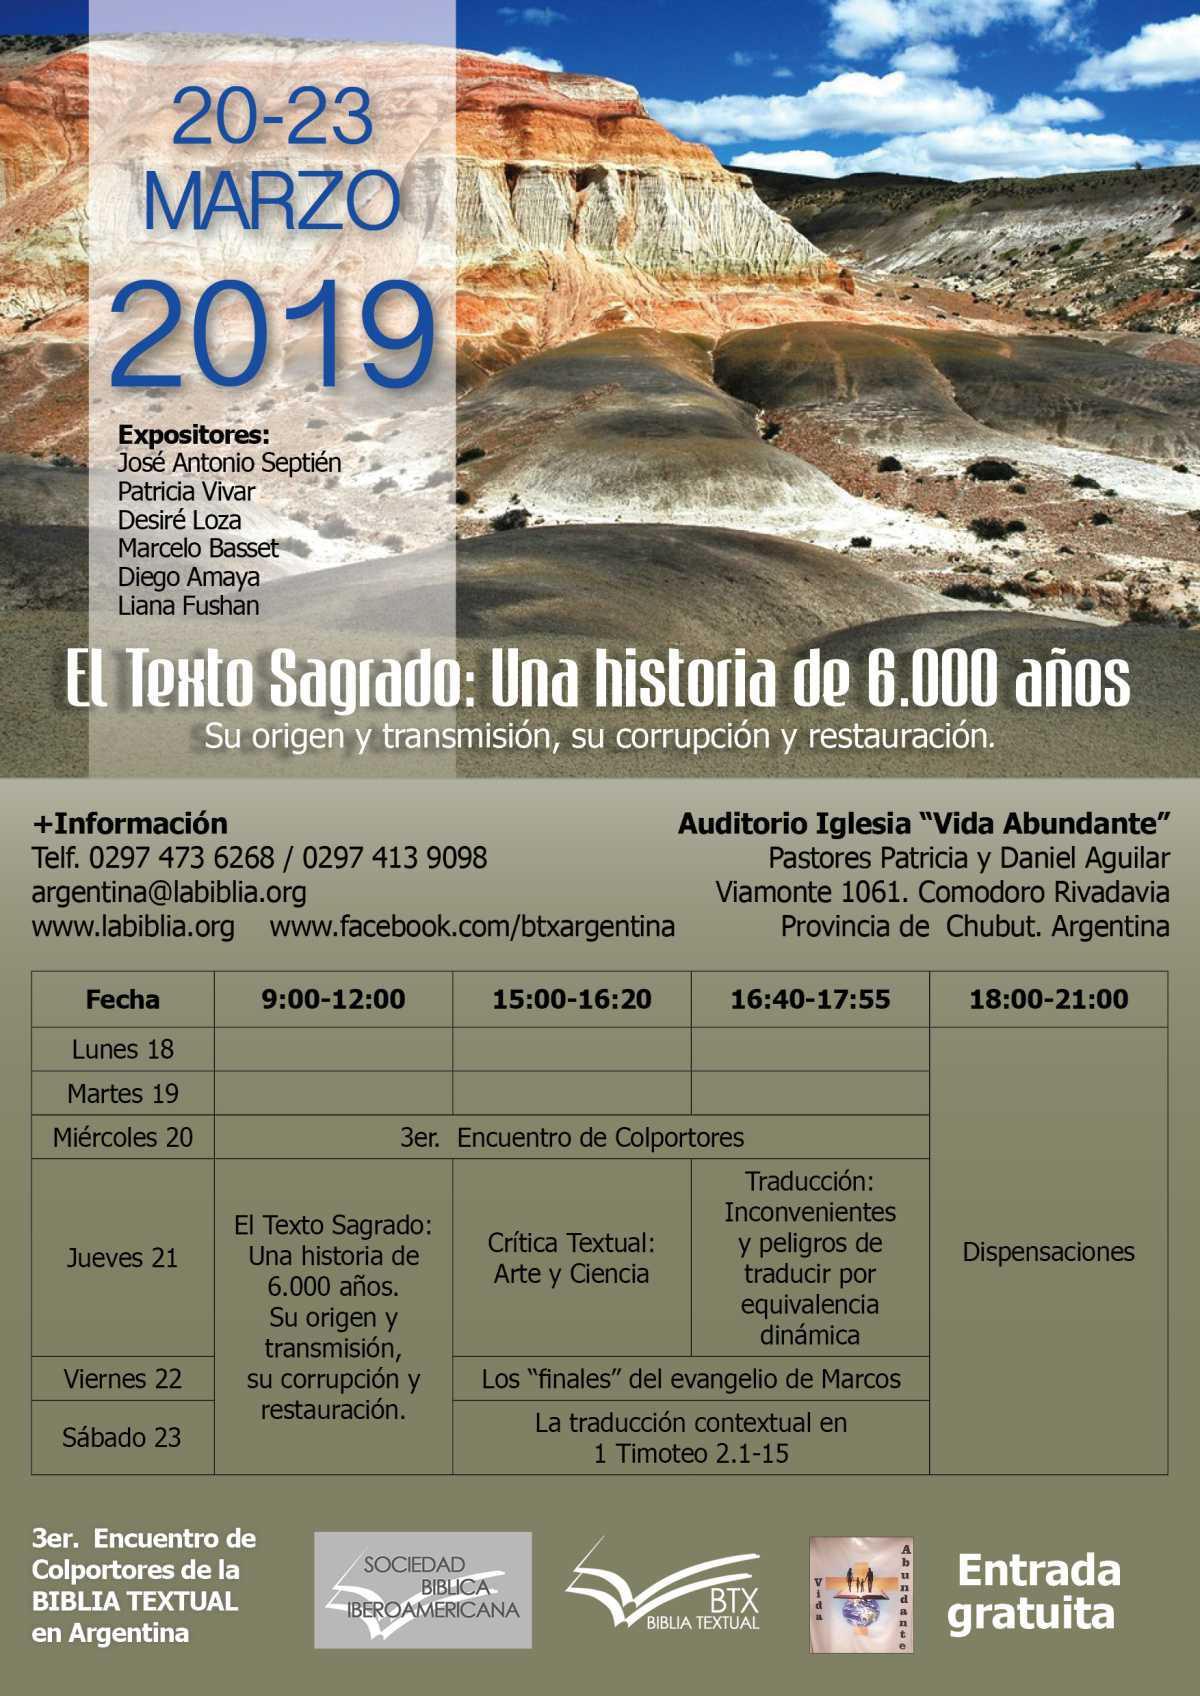 Argentina MAR 2019